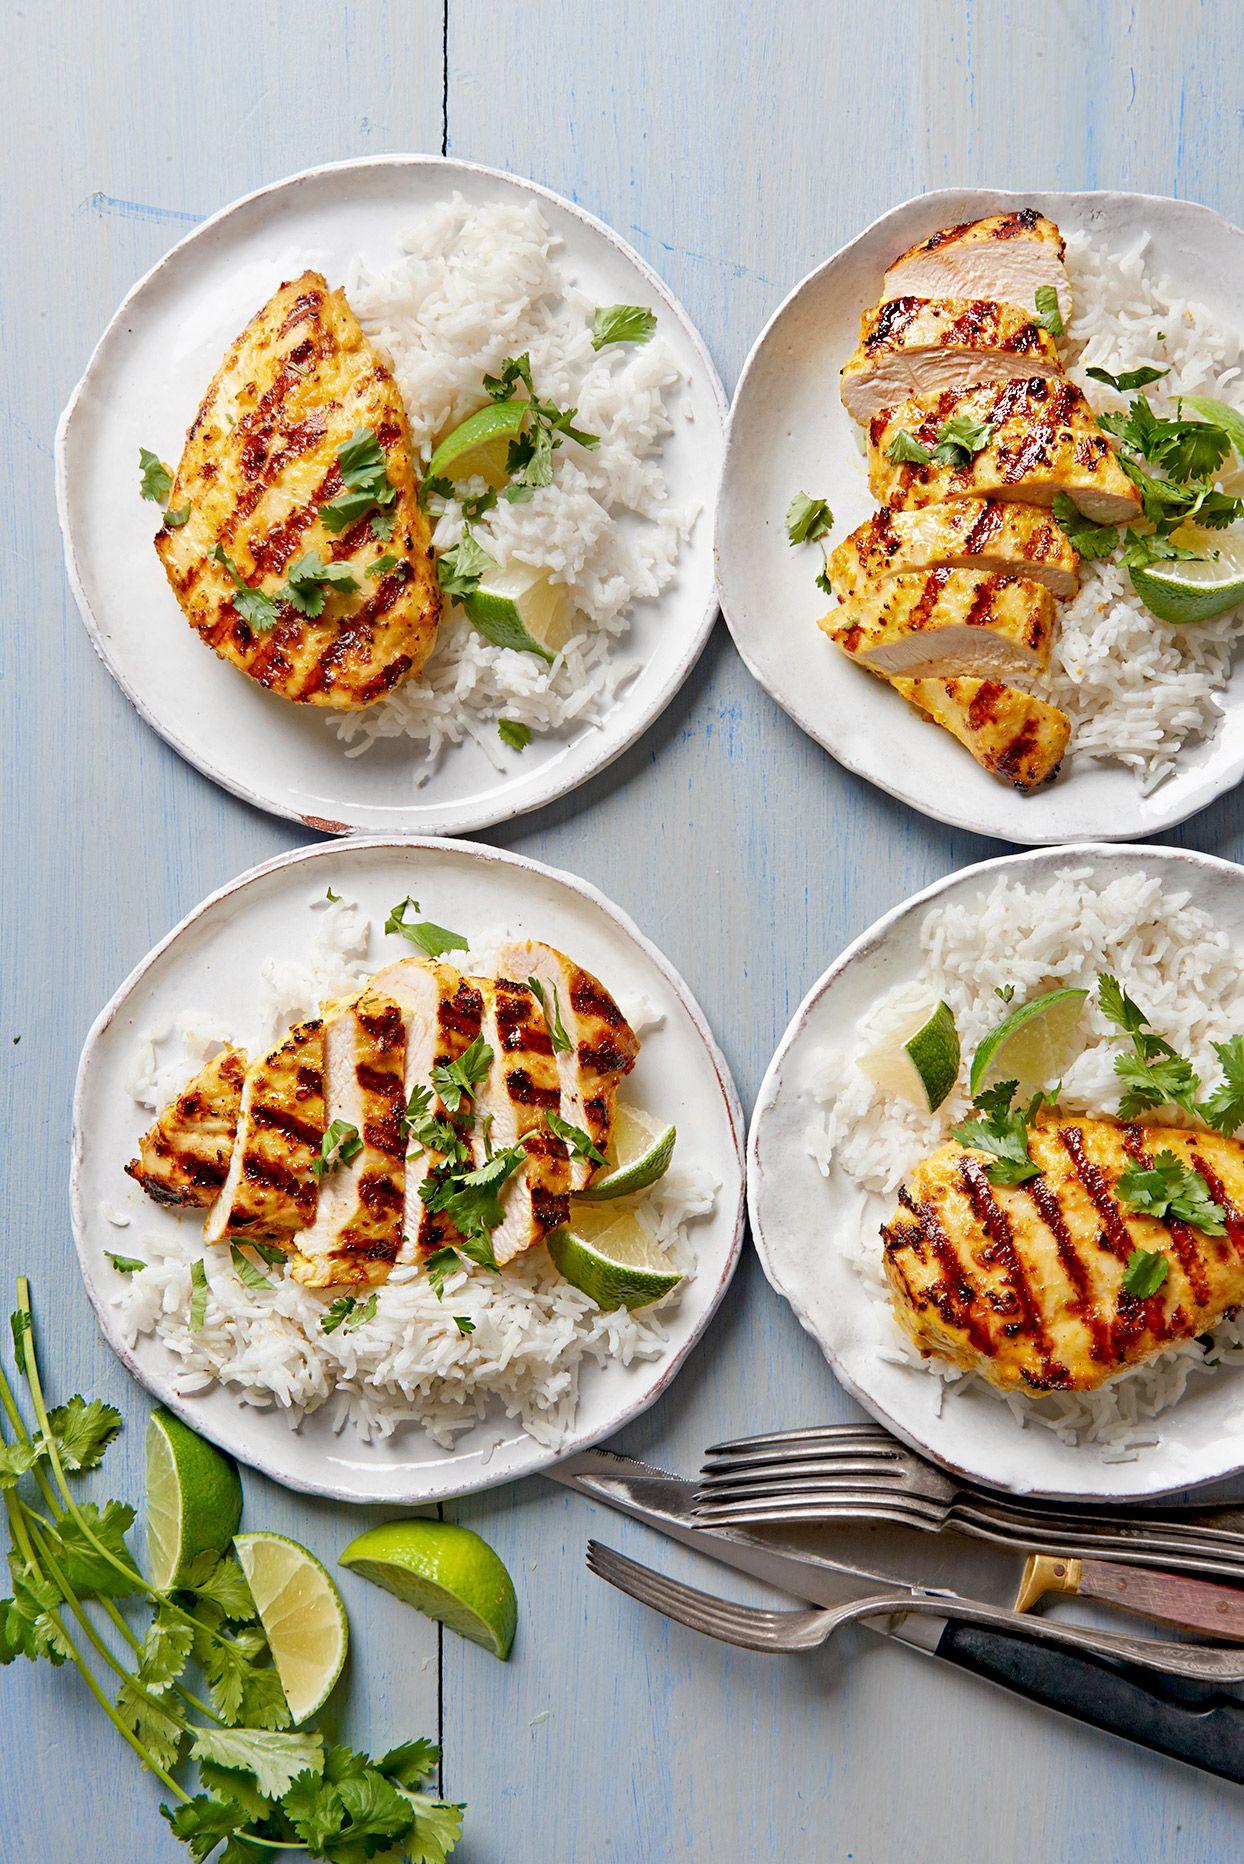 Turmeric Ginger Marinated Chicken Recipe Easy Chicken Dinner Recipes Healthy Dinner Recipes Easy Healthy Dinner